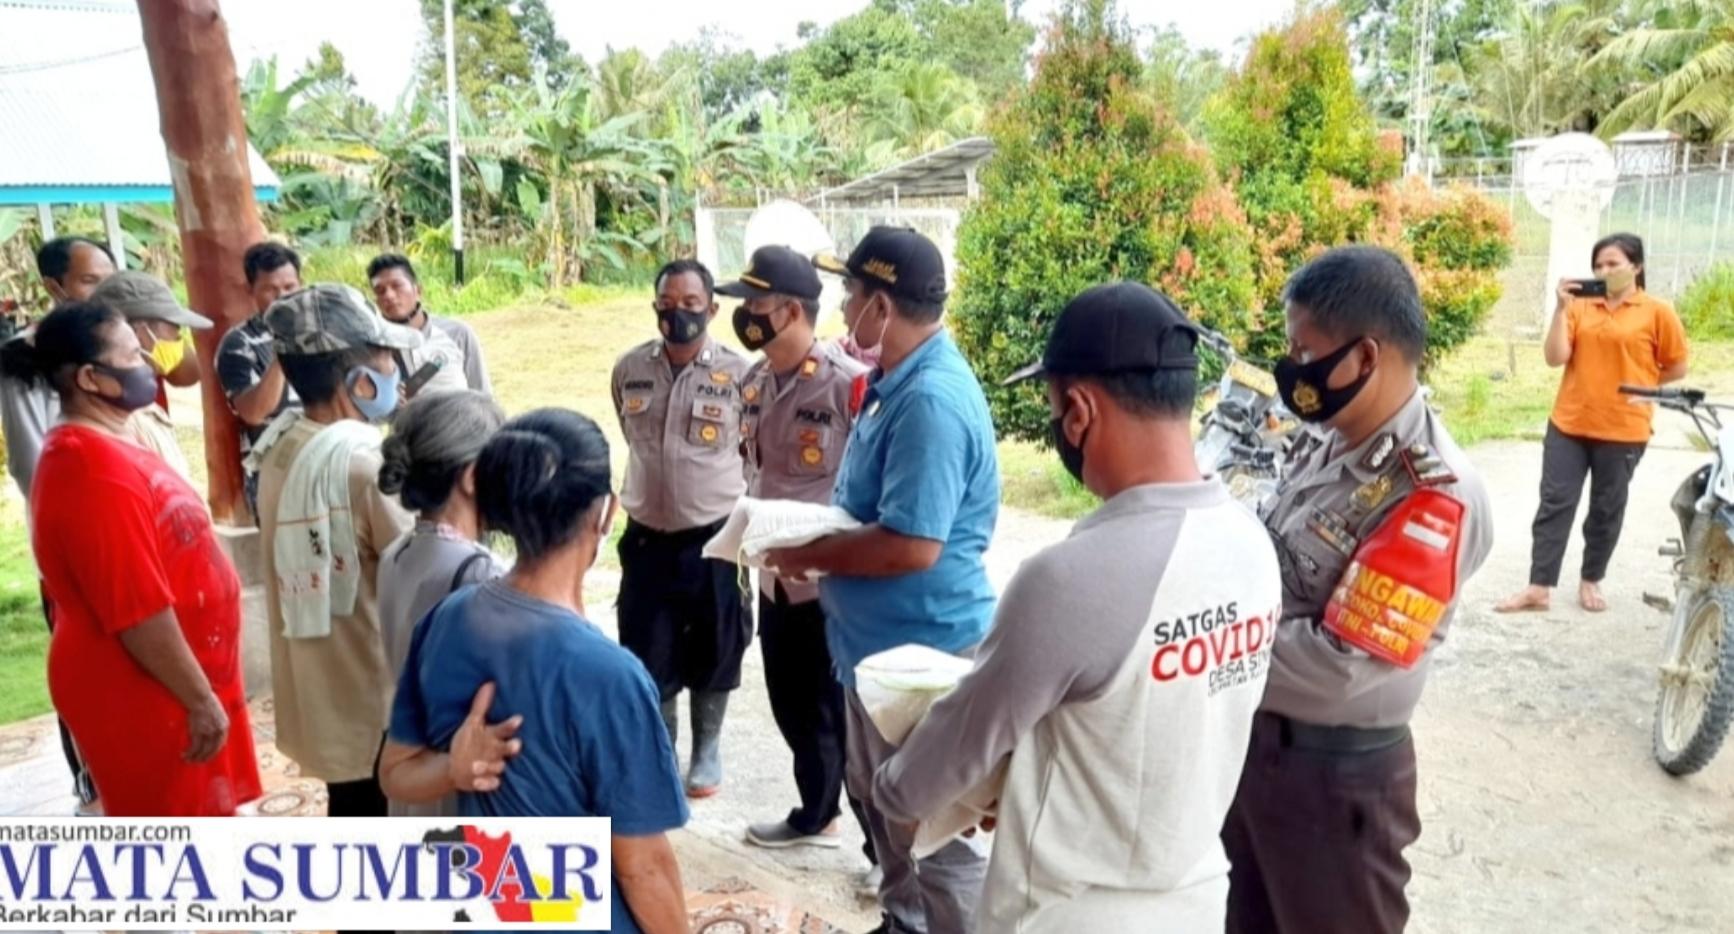 Peduli Daerah Pulau Terluar, Polsek Sikakap Salurkan Bantuan Beras Polri Untuk Desa Sinakak